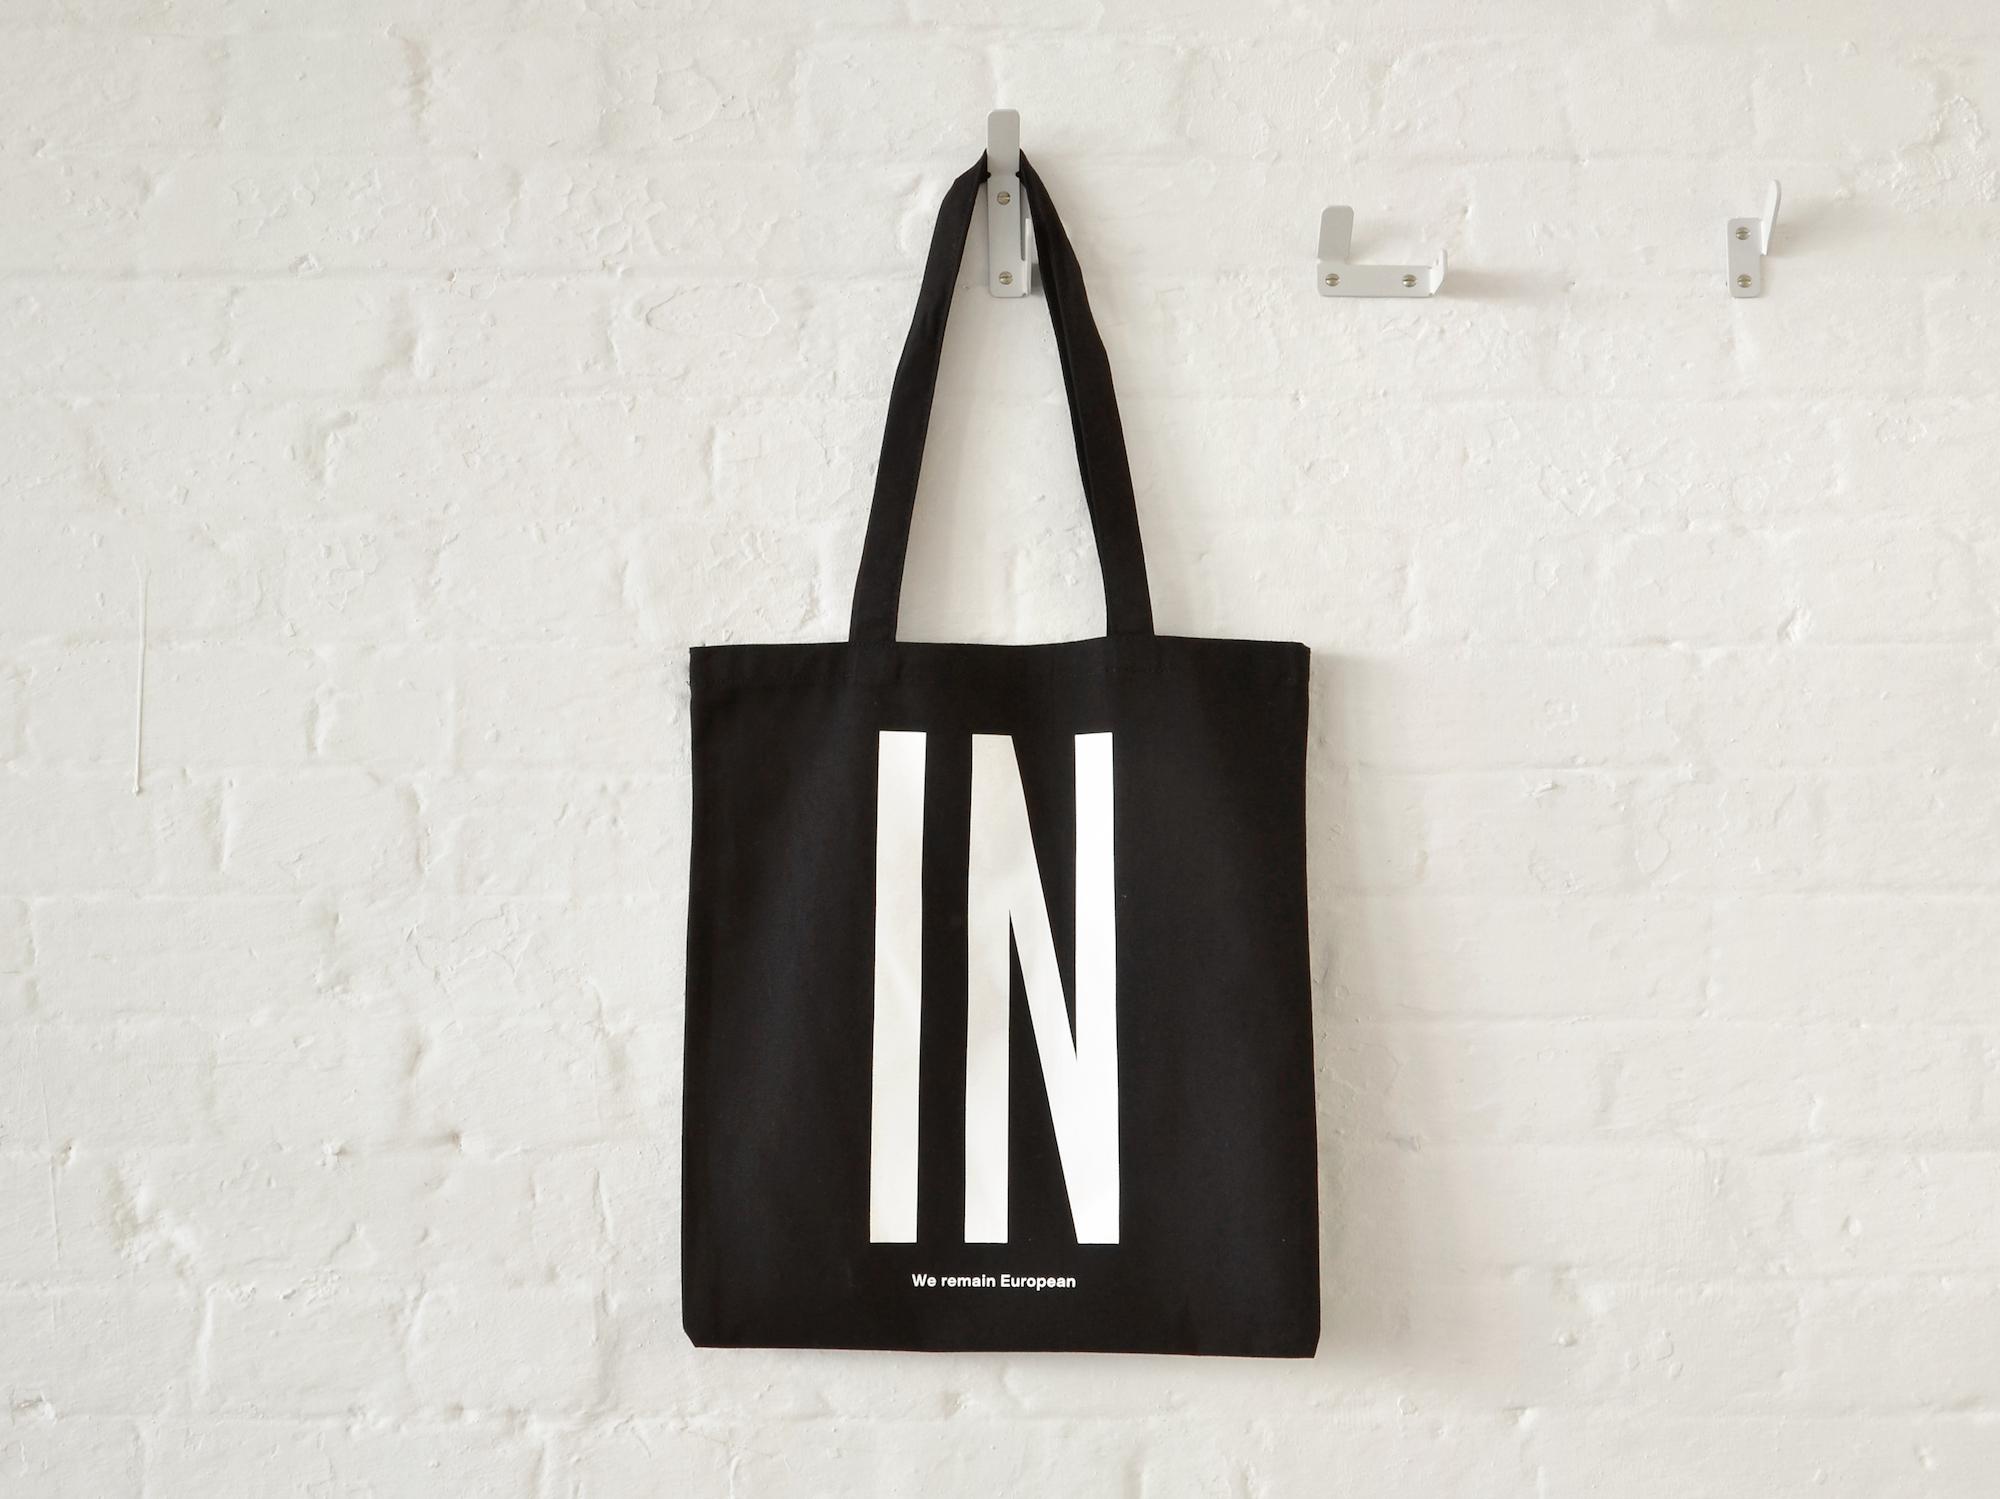 Pro-European Union bag by APFEL